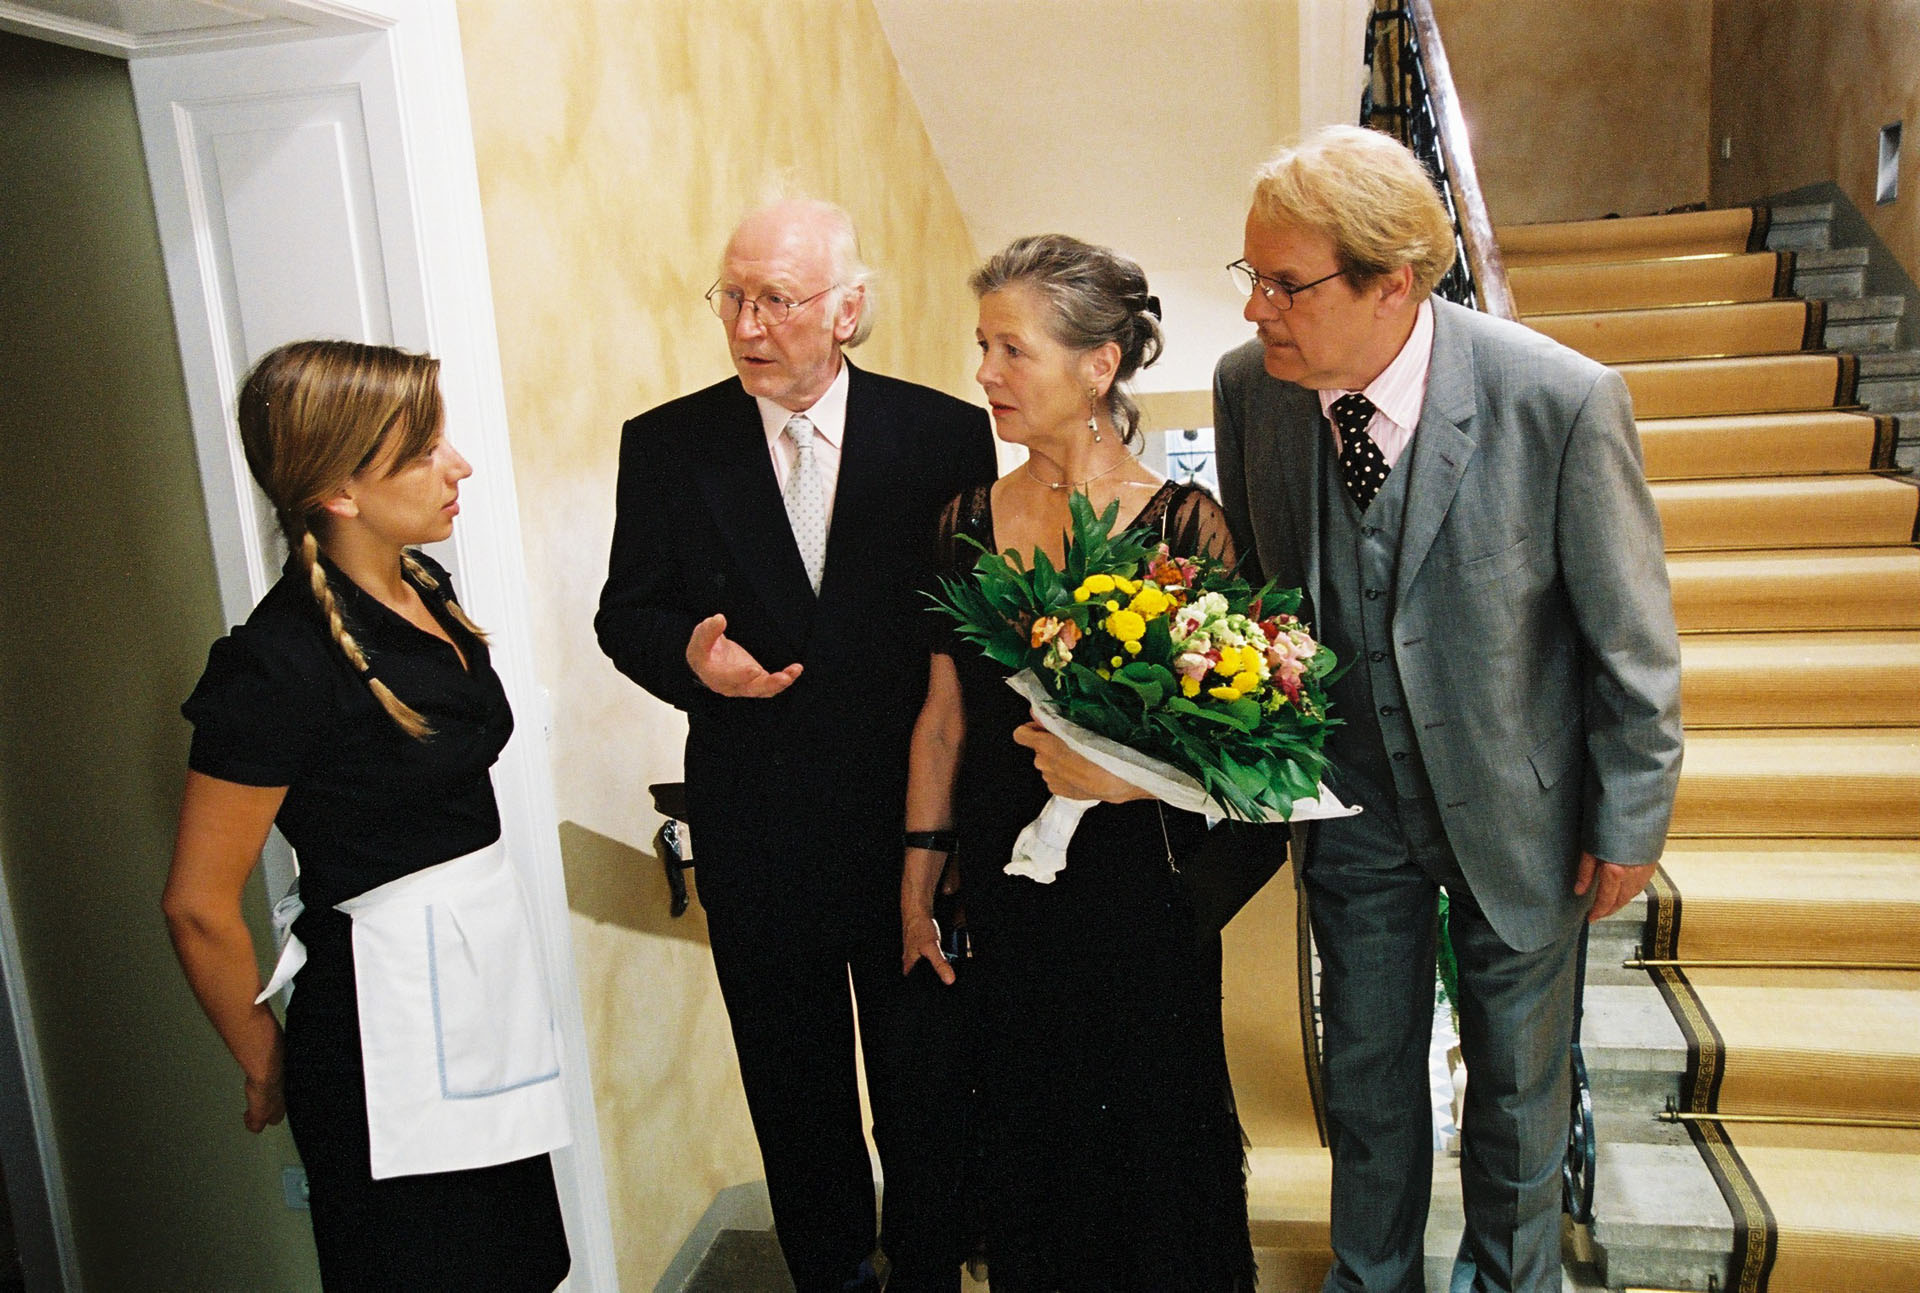 © Star*Film / Wolfgang Fuhrmann (Star*Film) - Martina Schwab, Karl Merkatz, Helma Gautier, Peter Fricke